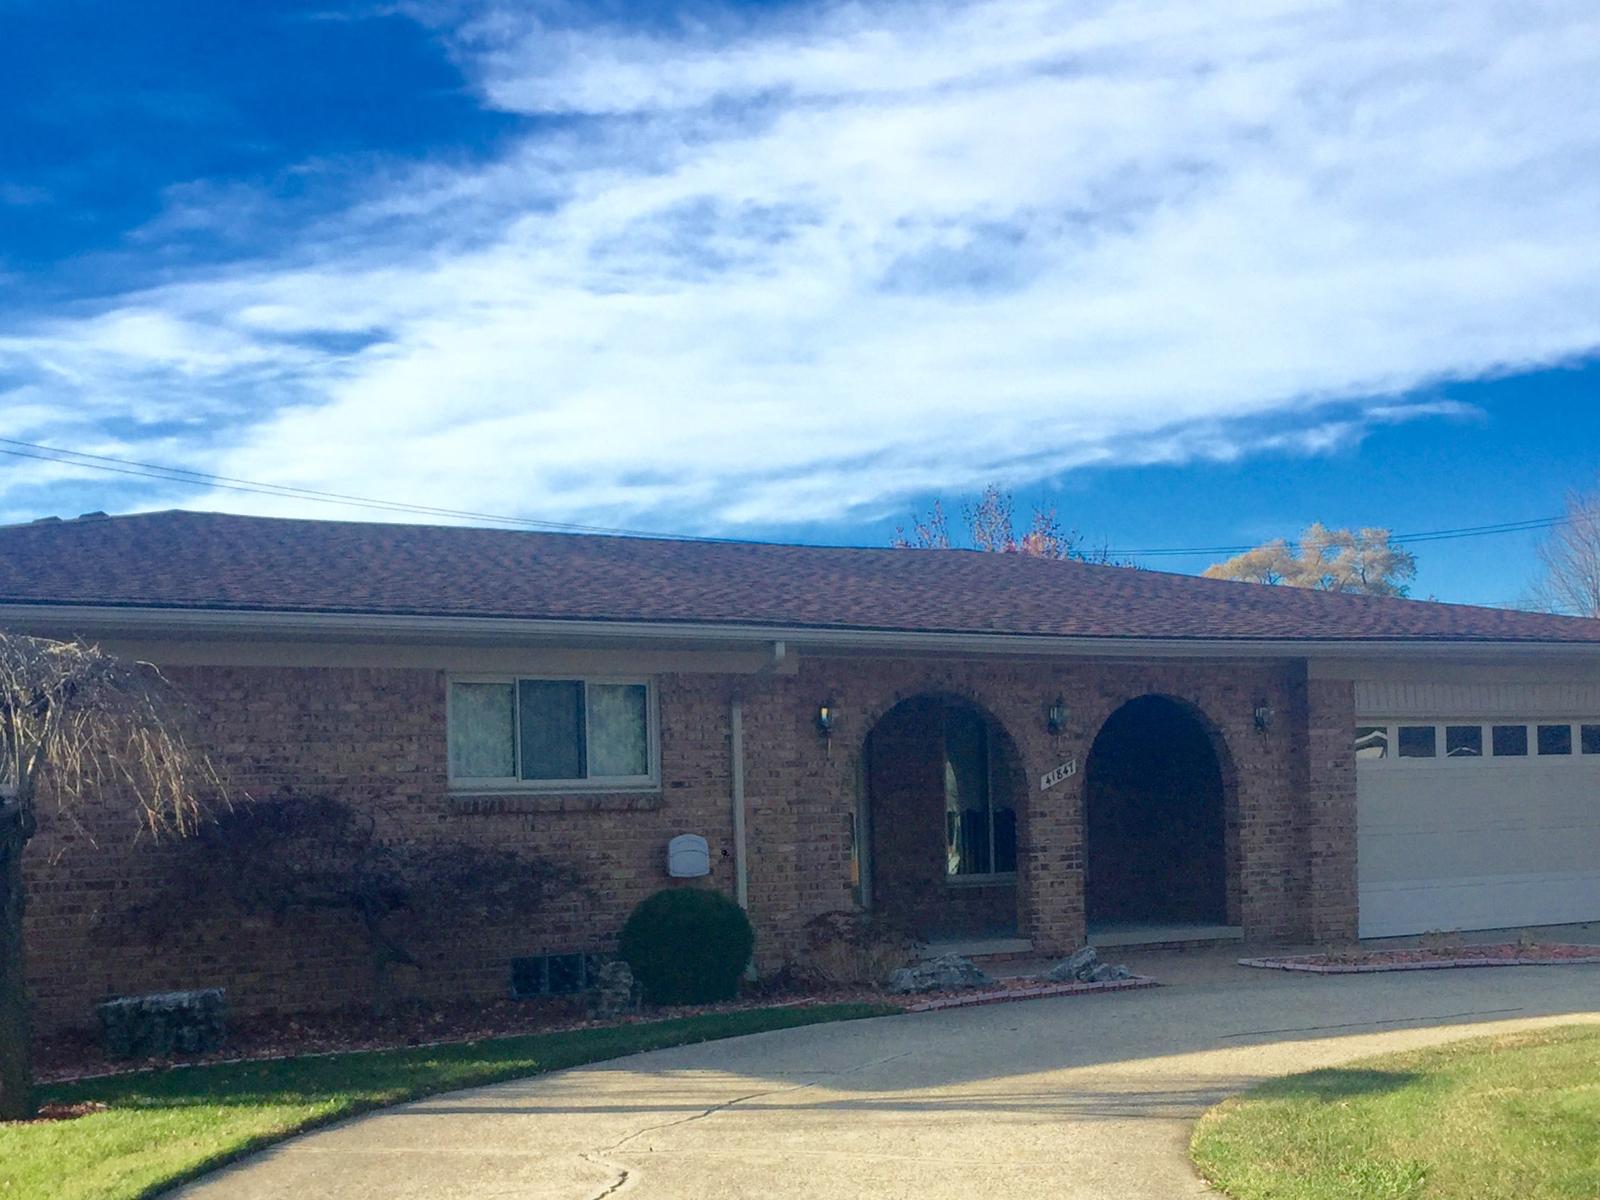 独户住宅 为 销售 在 Sterling Heights 41847 Marold Drive Sterling Heights, 密歇根州 48314 美国